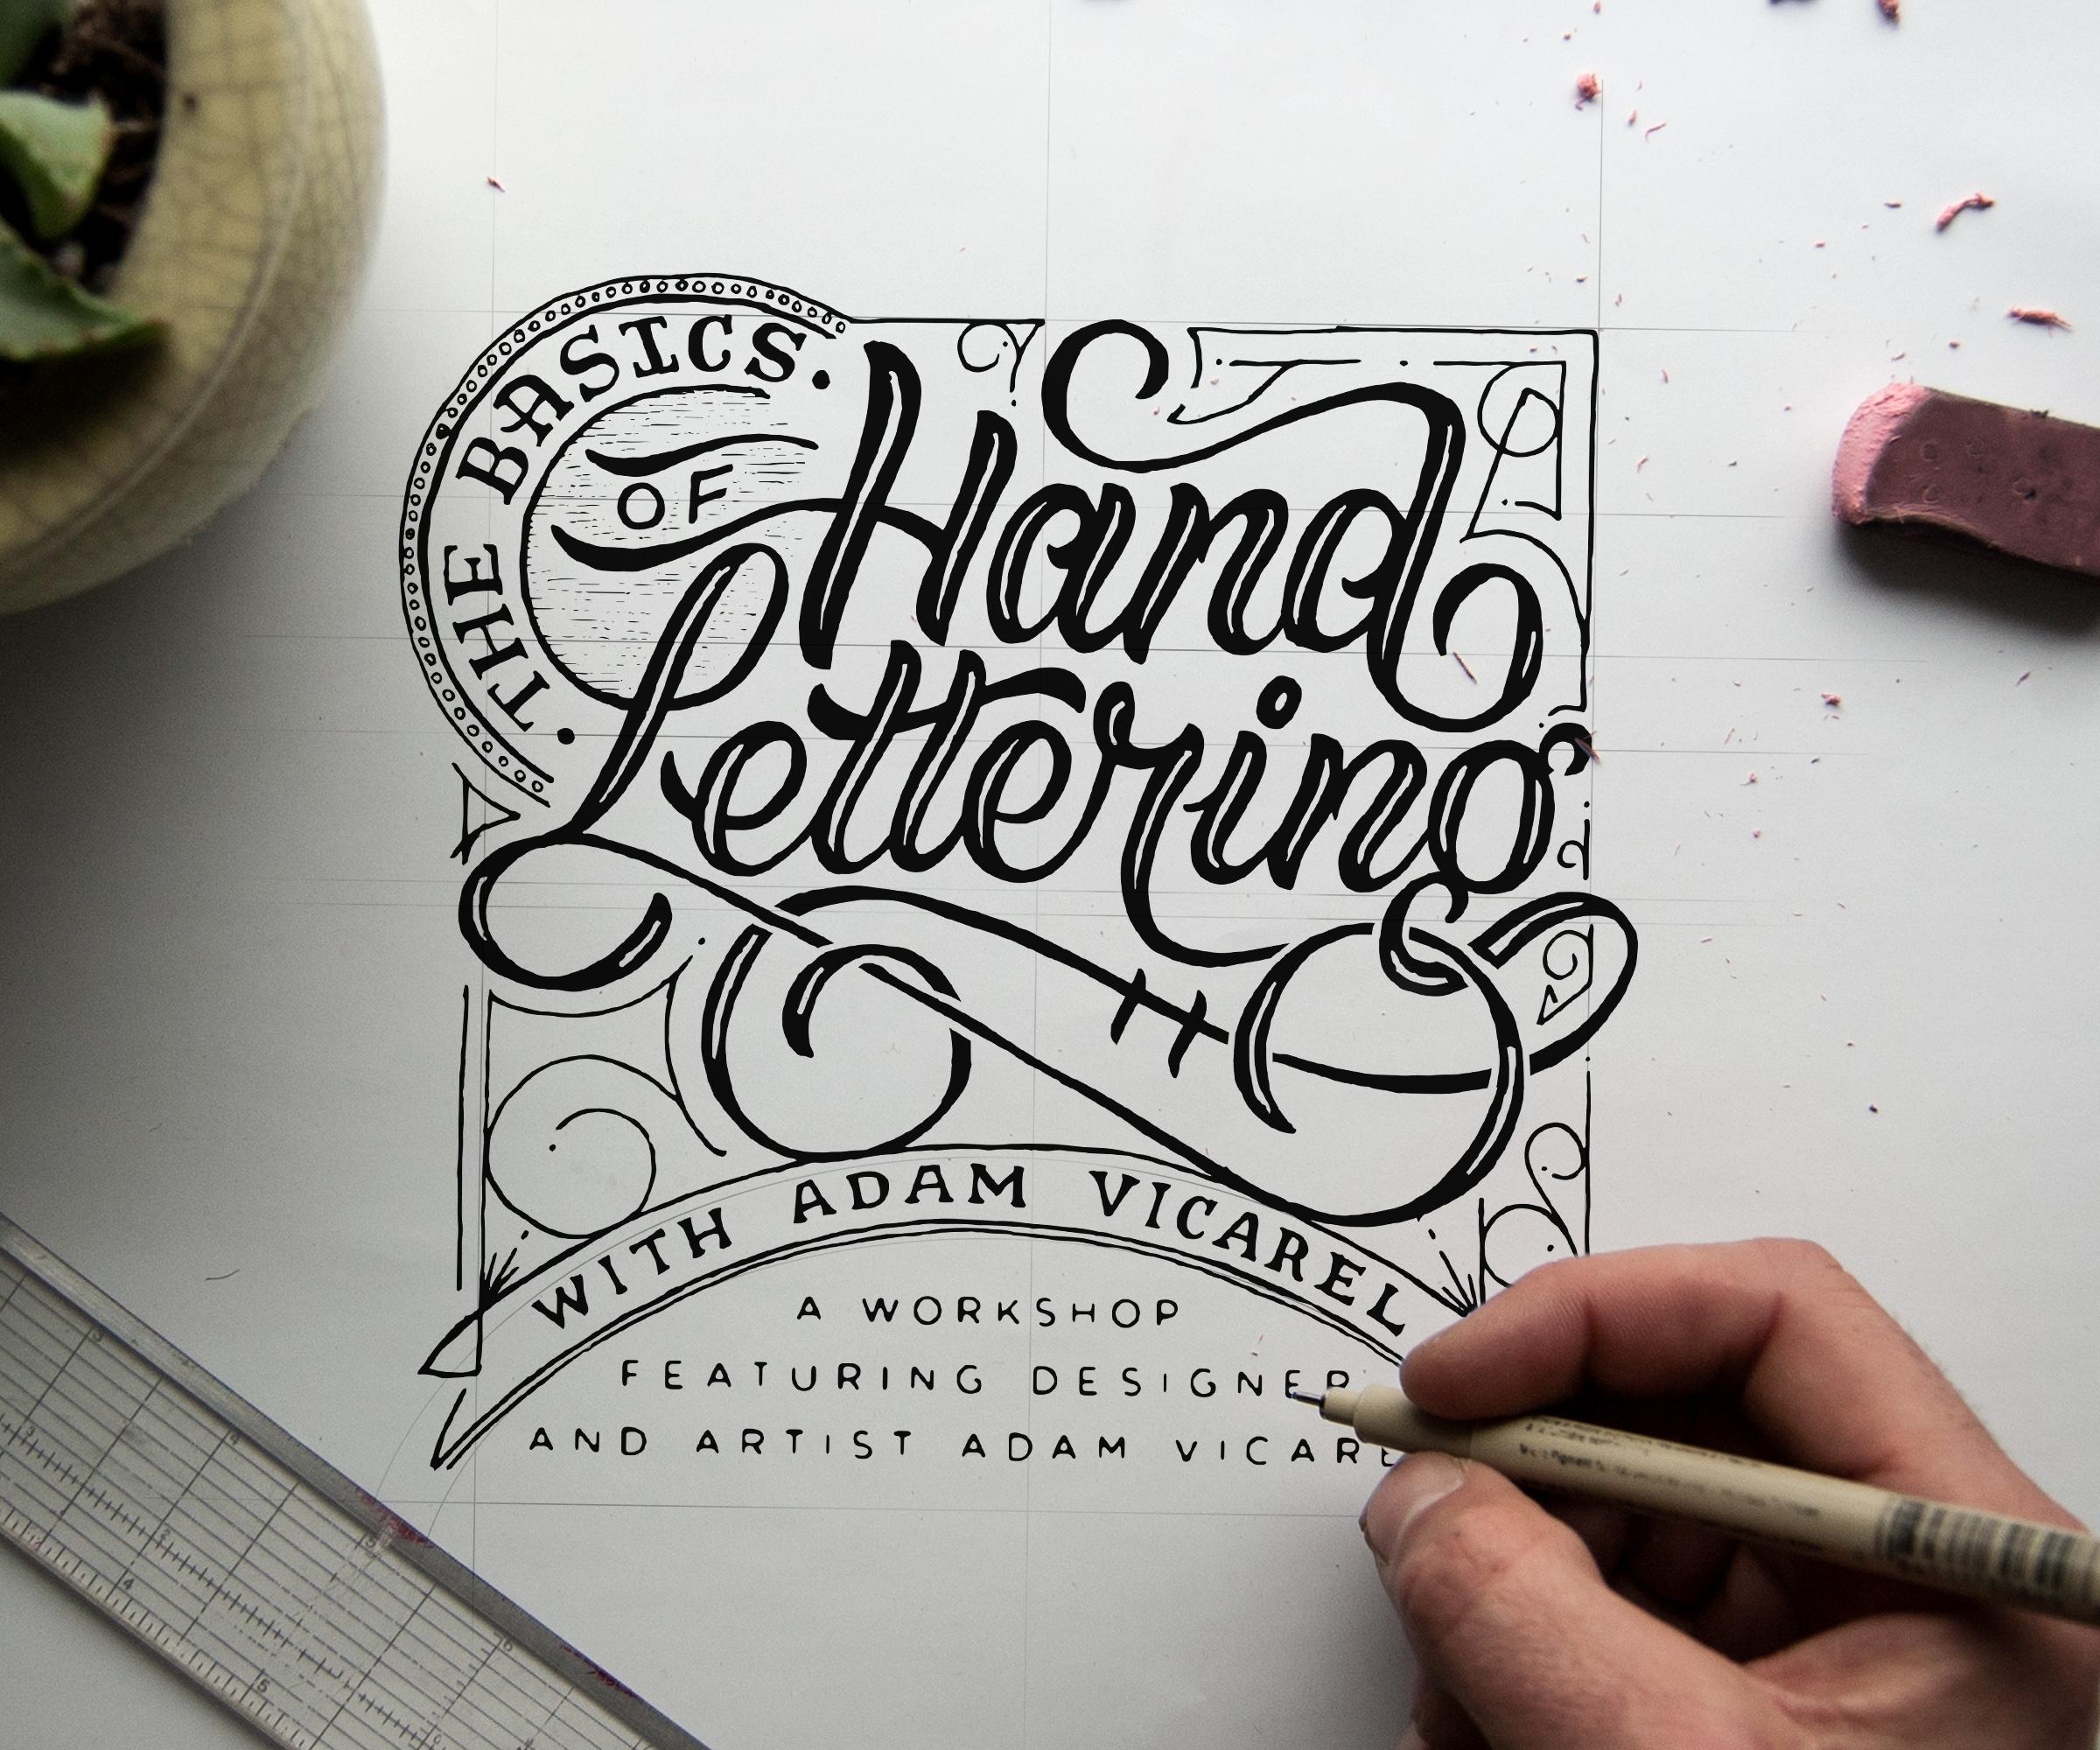 GT.LetterClassDrawing.Ad.03a.jpg